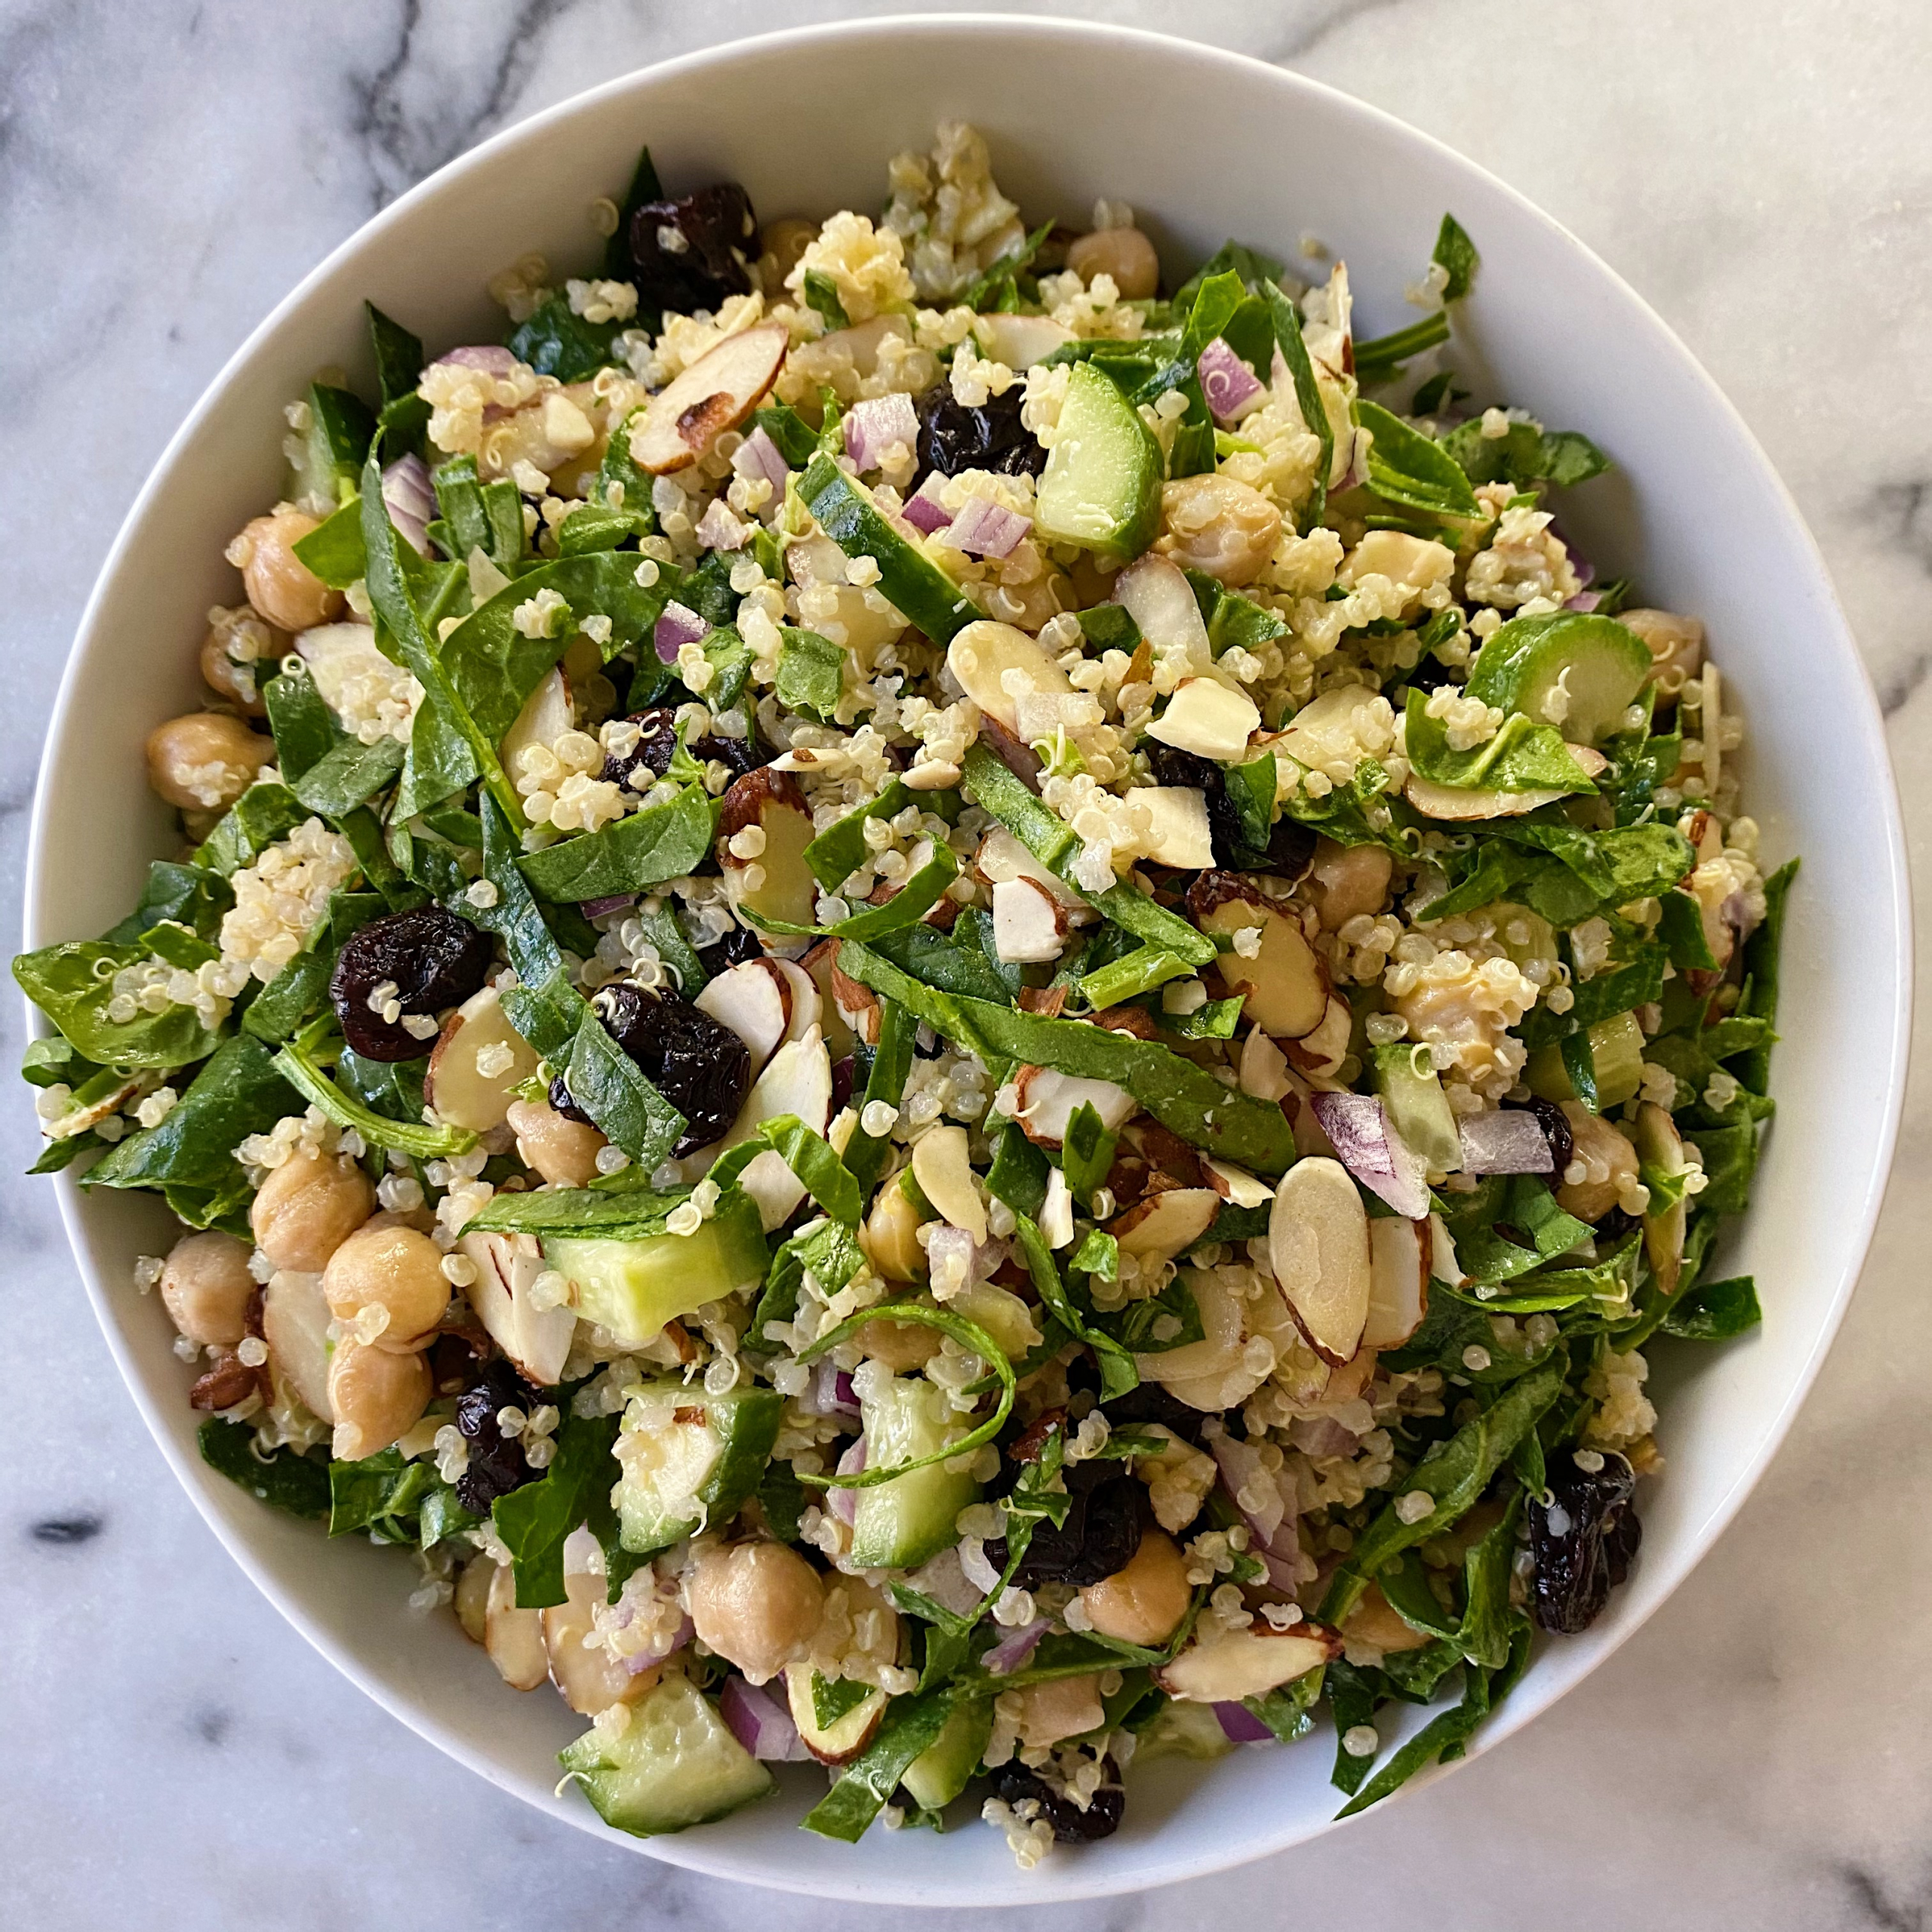 Simple spinach quiona salad easy recipe gluten free www.healthygffamily.com